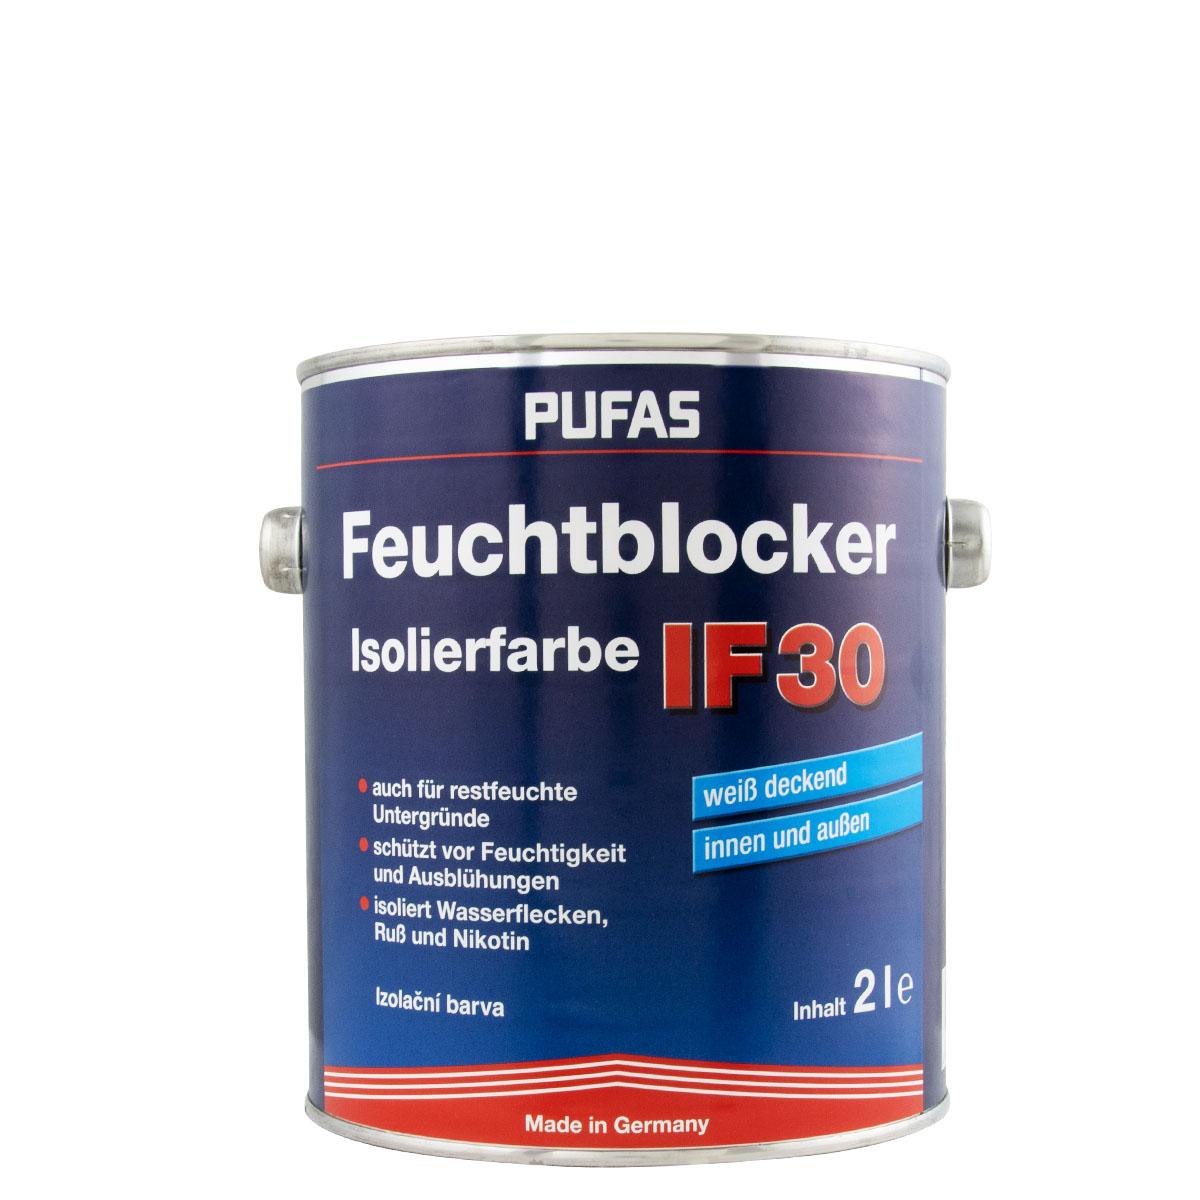 Pufas Isolierfarbe 2L weiss, Feuchtblocker, aromatenfrei